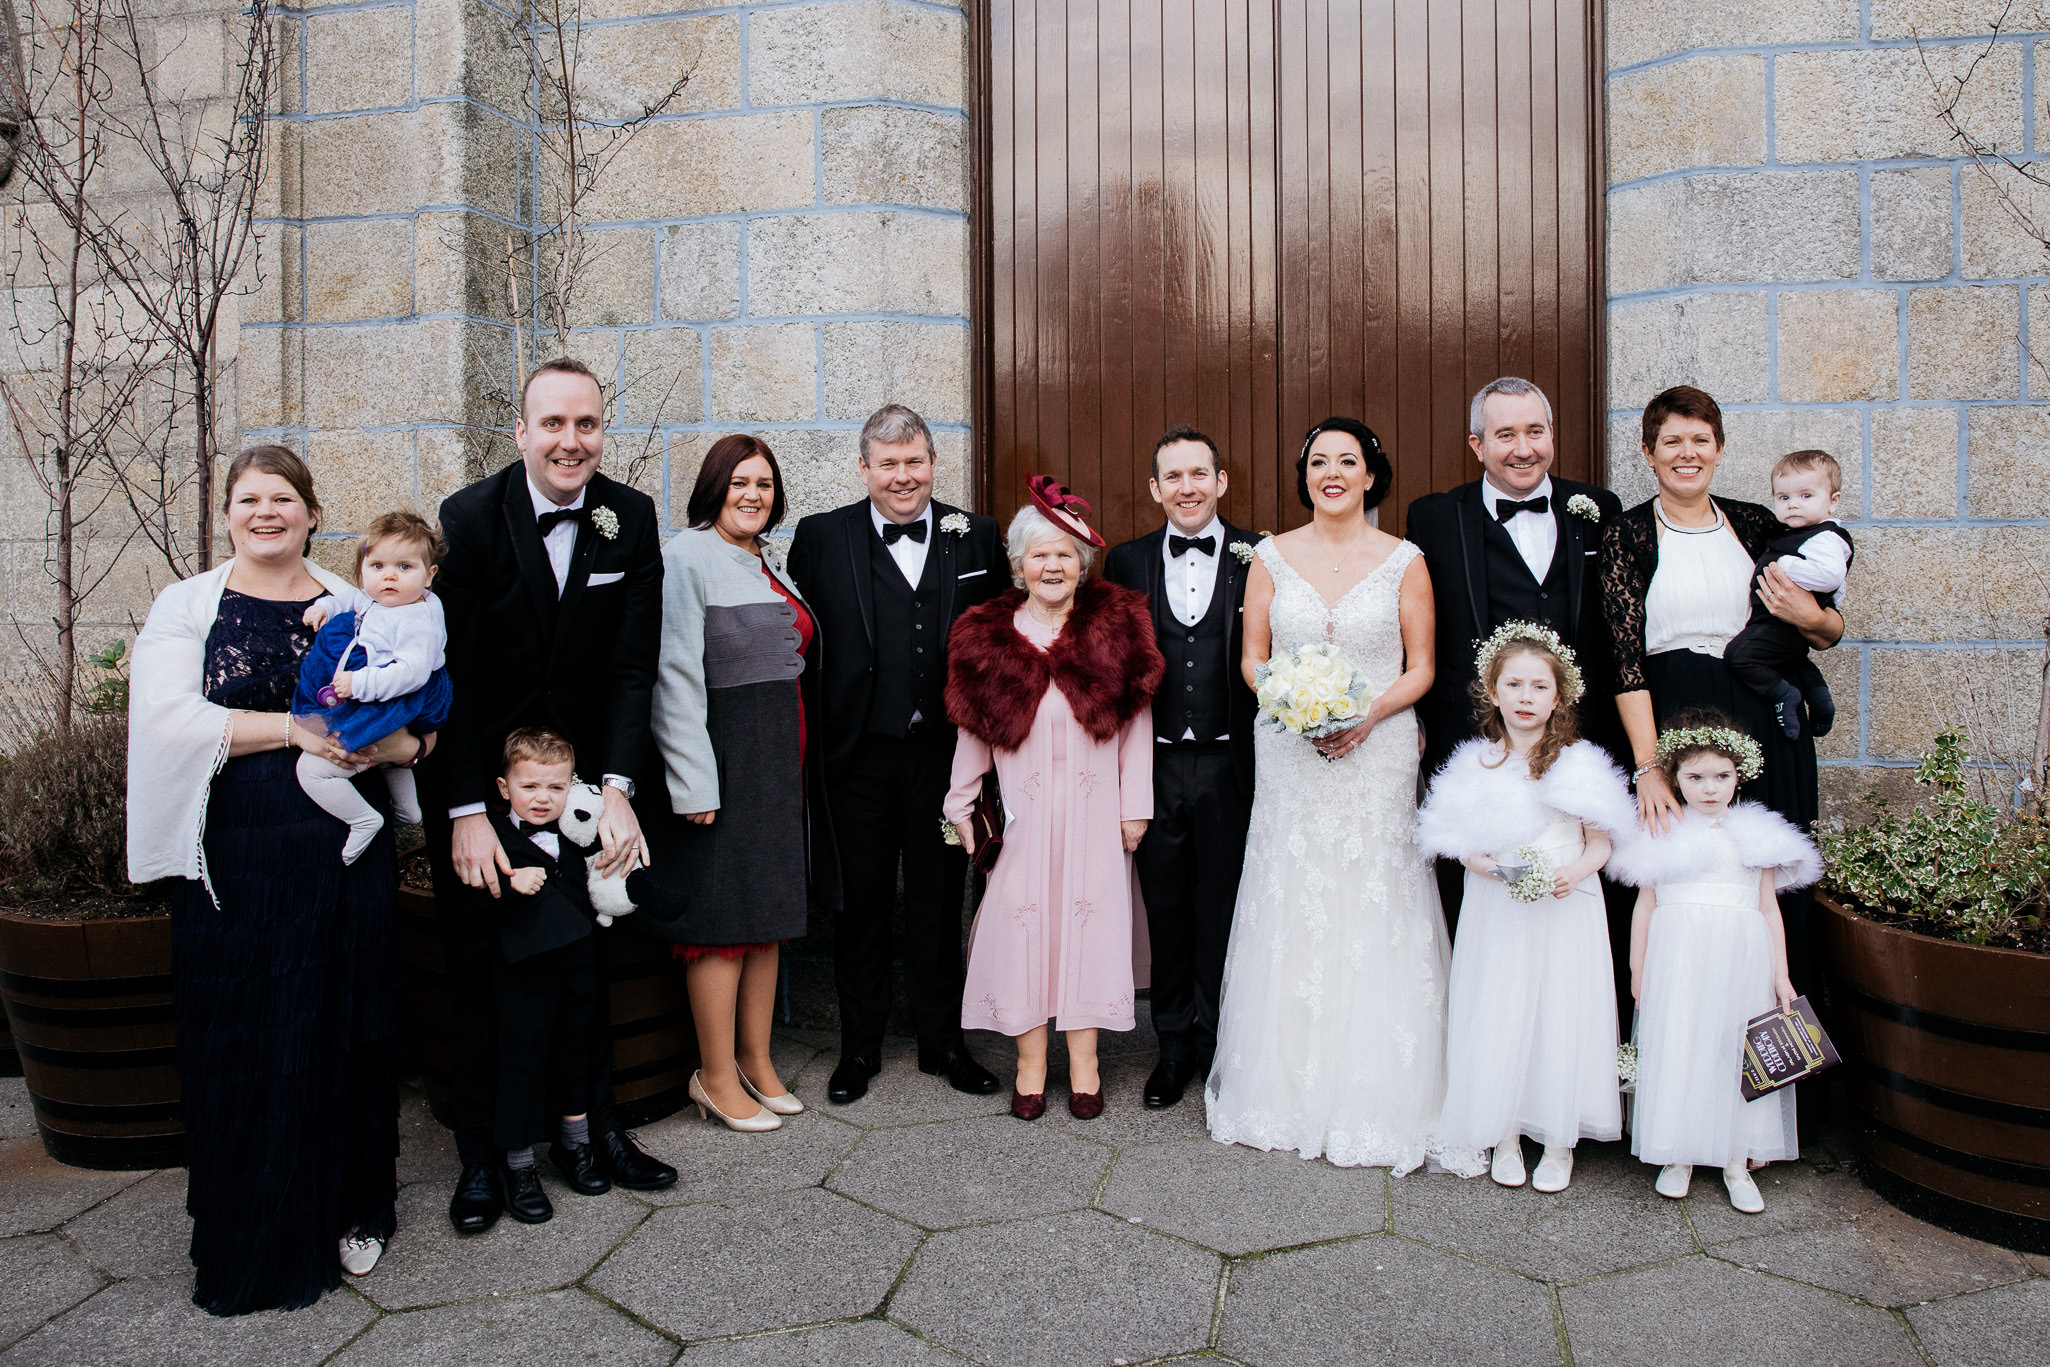 clairebyrnephotography-wedding-sparklers-christmas-orlagh-daithi-7.jpg